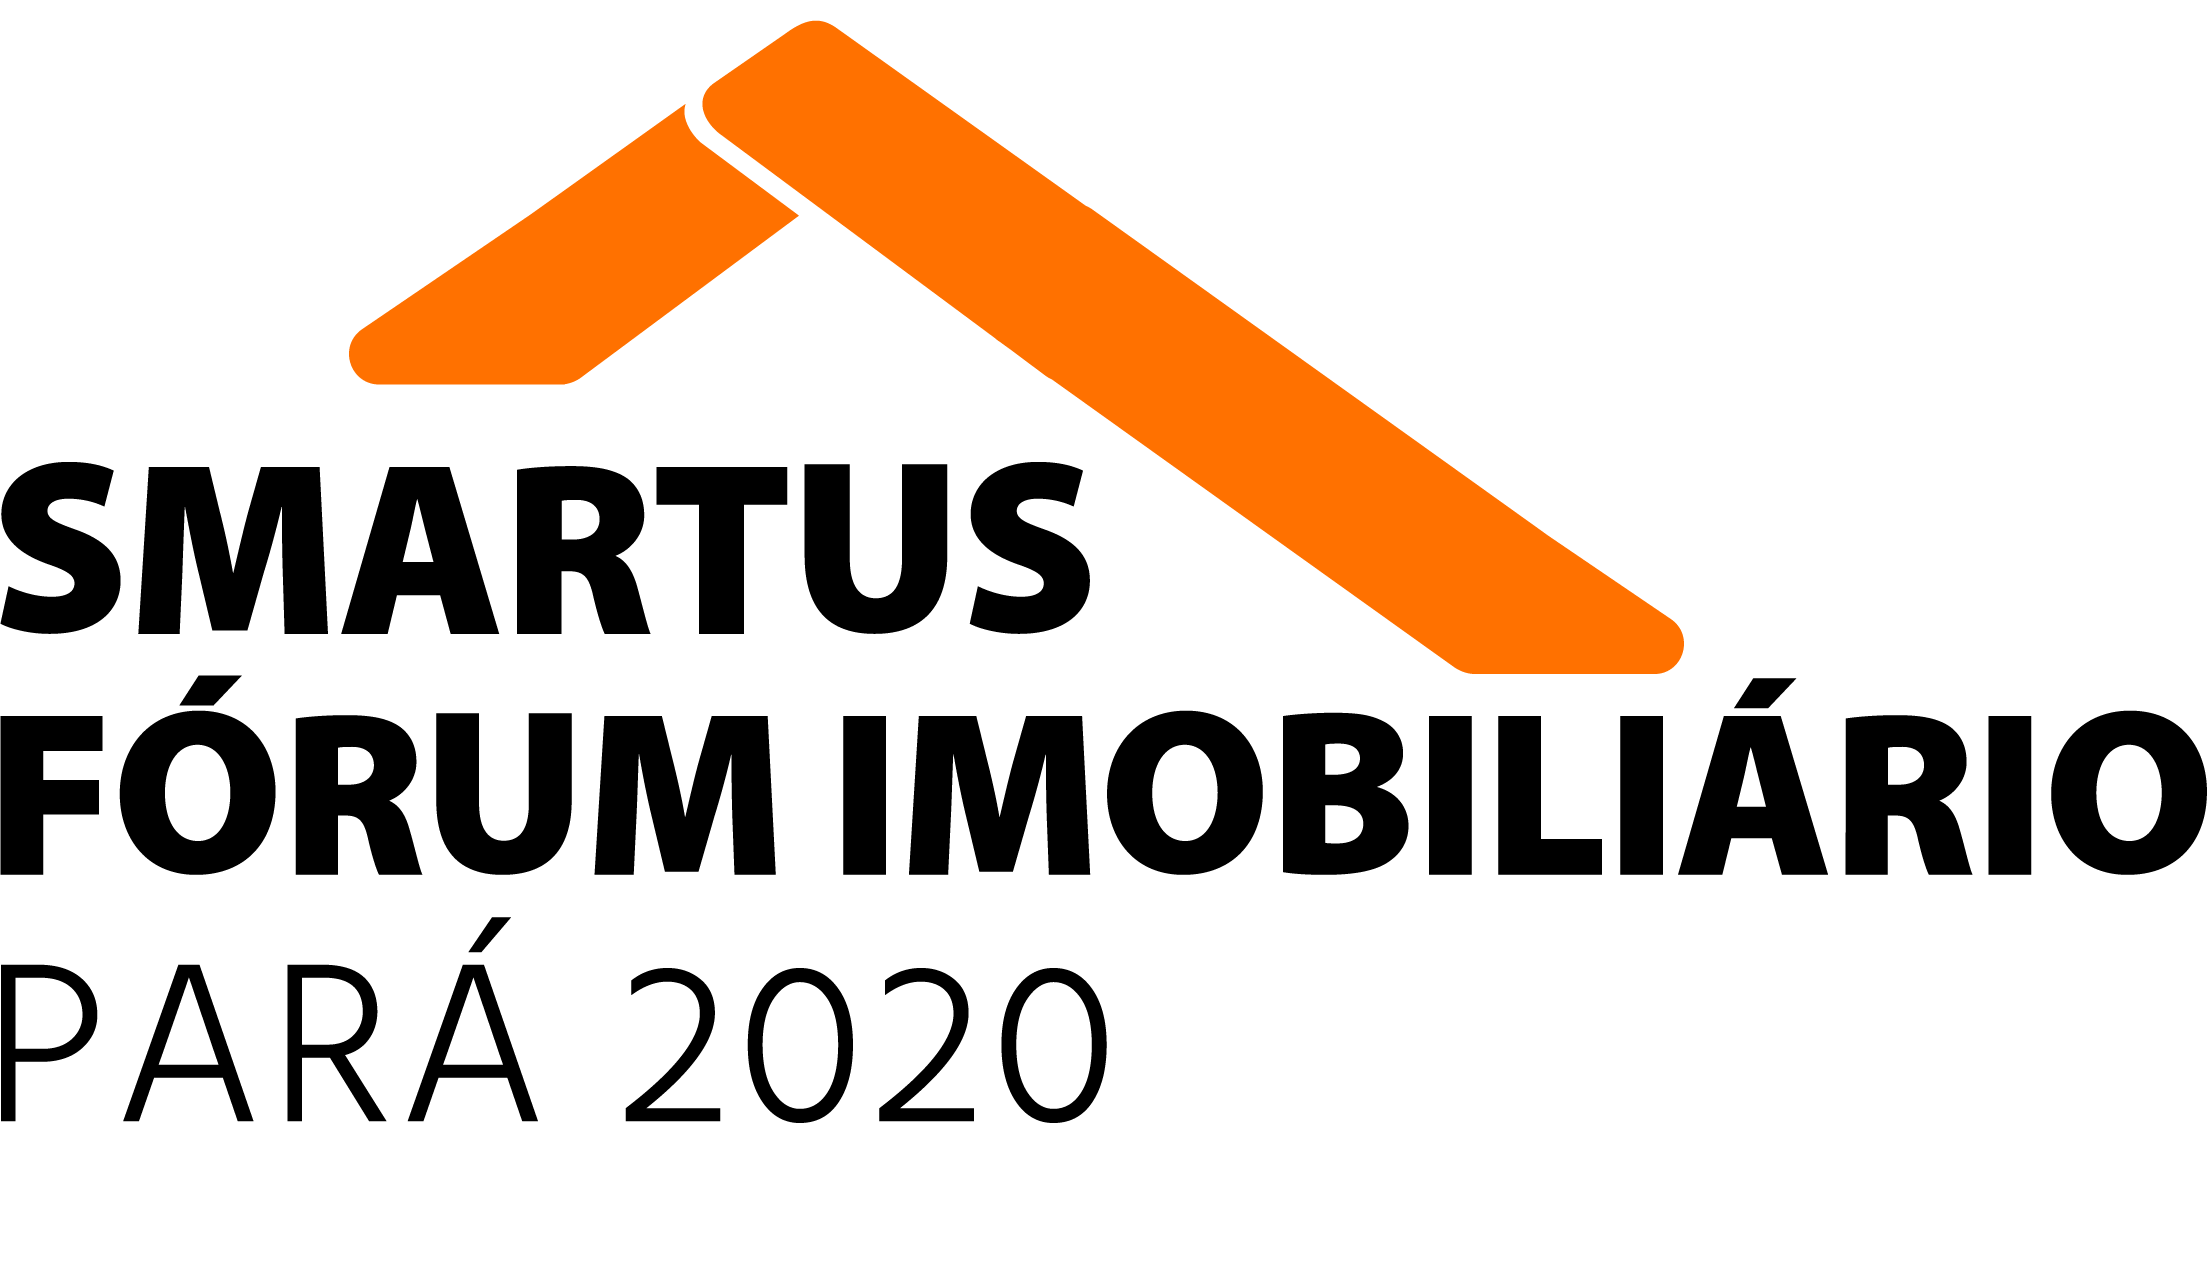 Logo eventos - Pará 2020_Prancheta 1